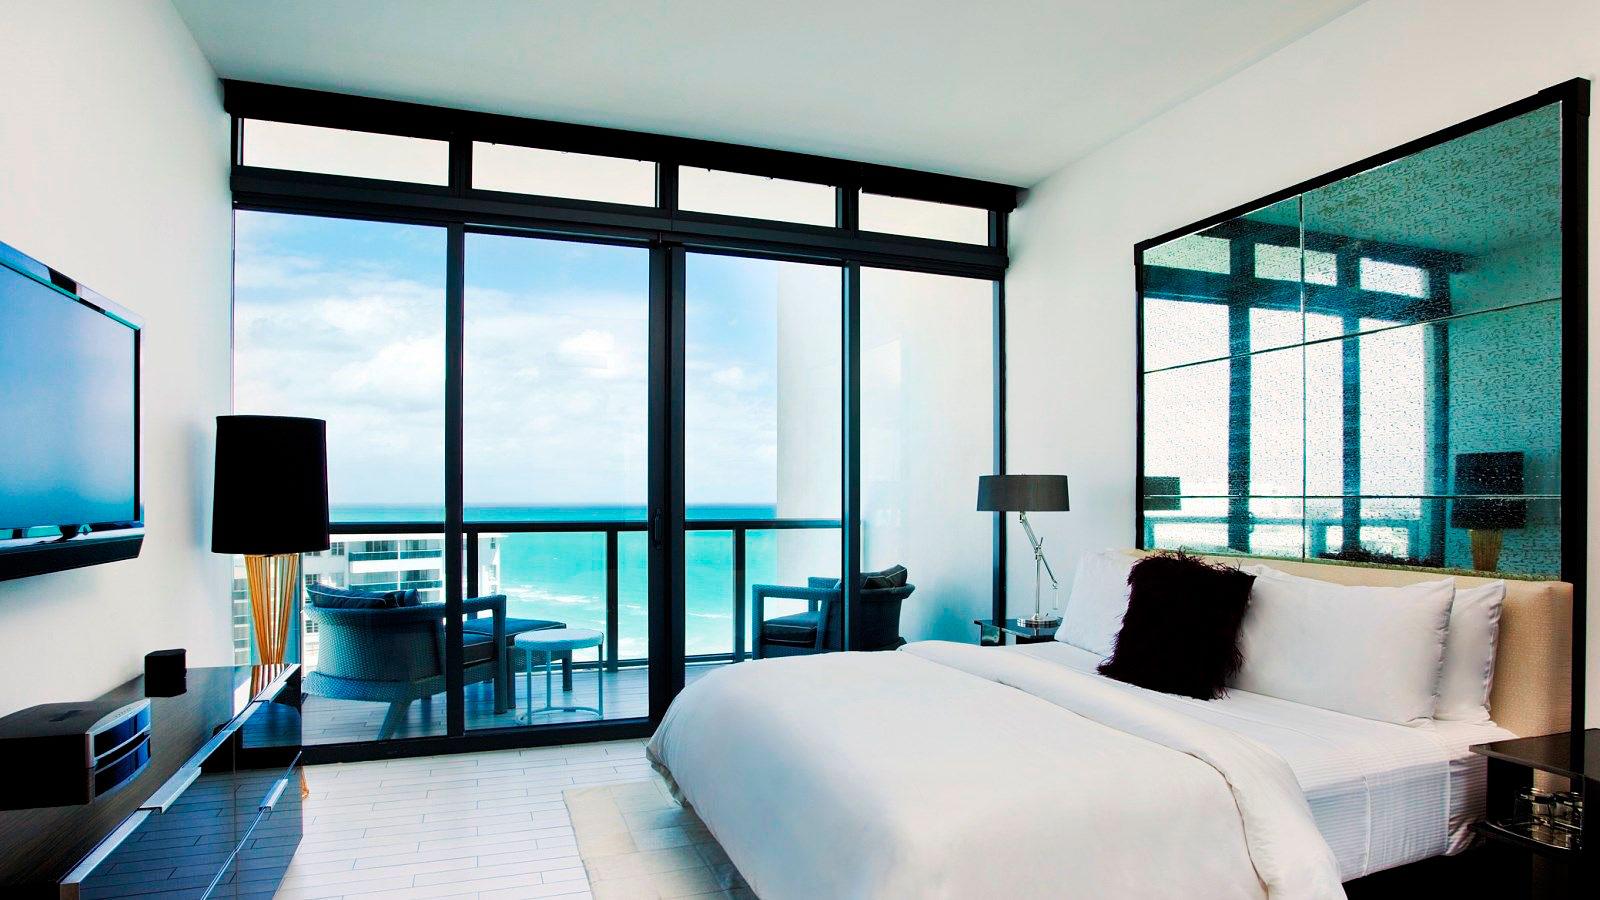 Assets vinjatek 2 bedroom suites south beach miami florida